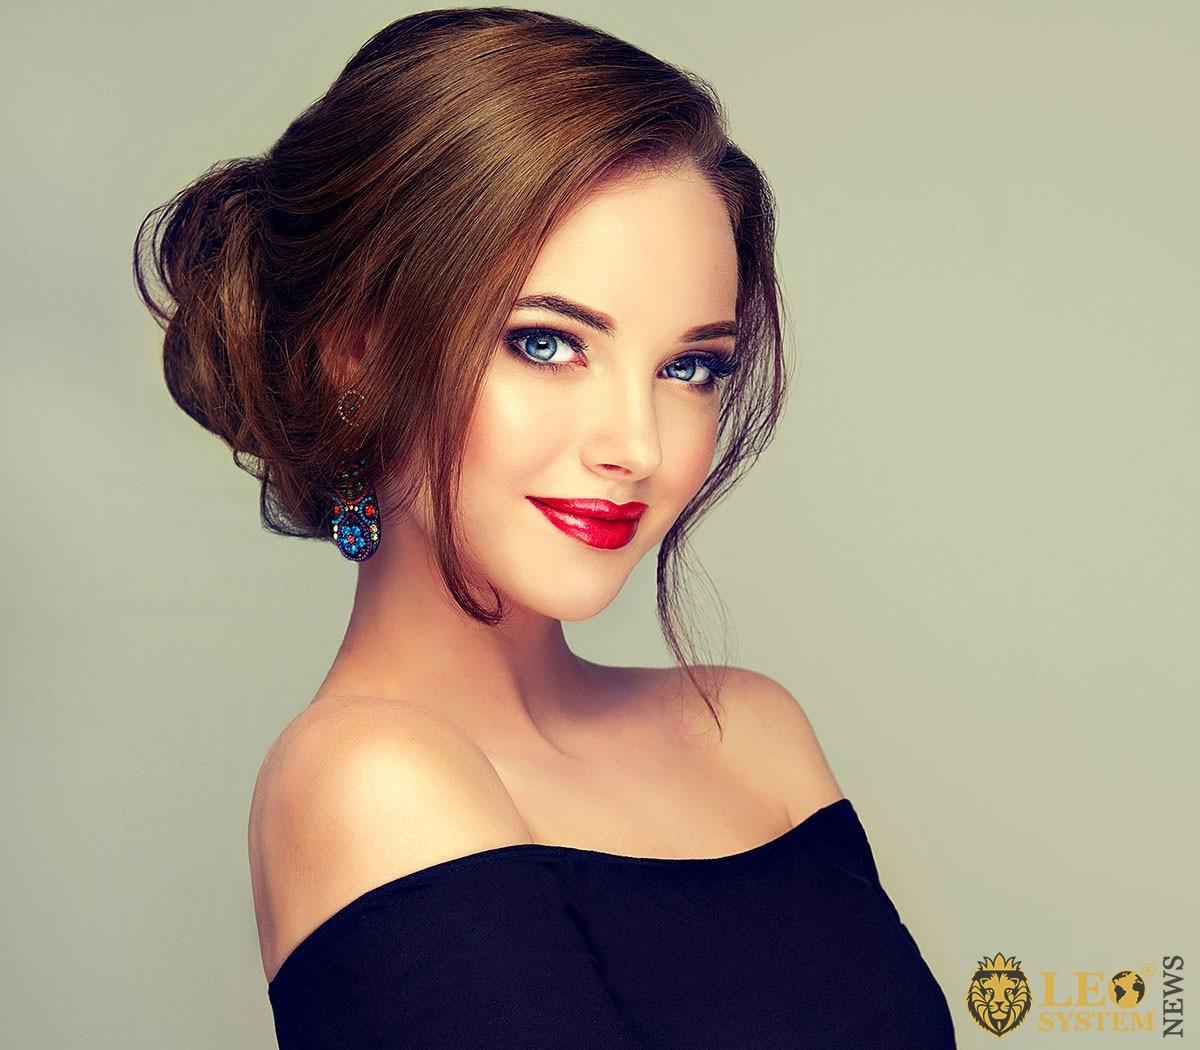 Image of a beautiful girl with evening makeup